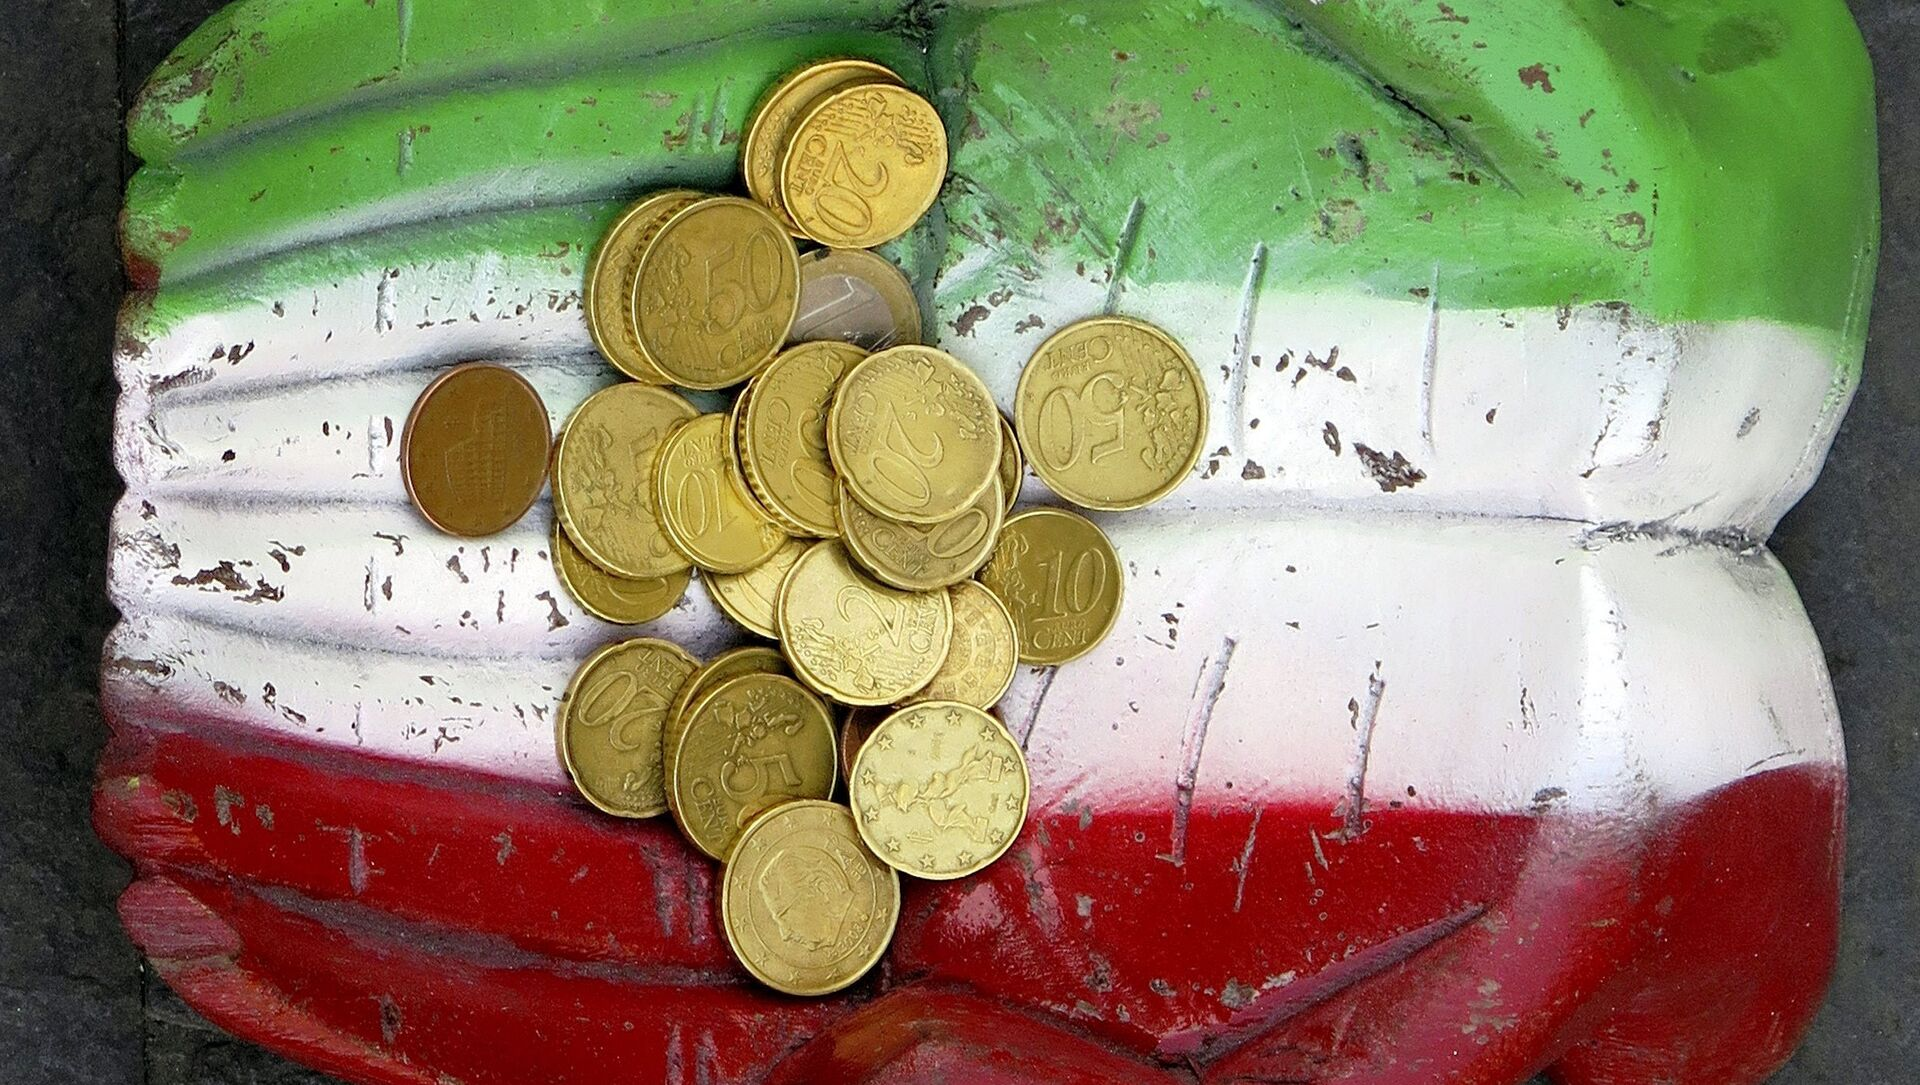 Monete euro e la bandiera italiana - Sputnik Italia, 1920, 04.03.2021